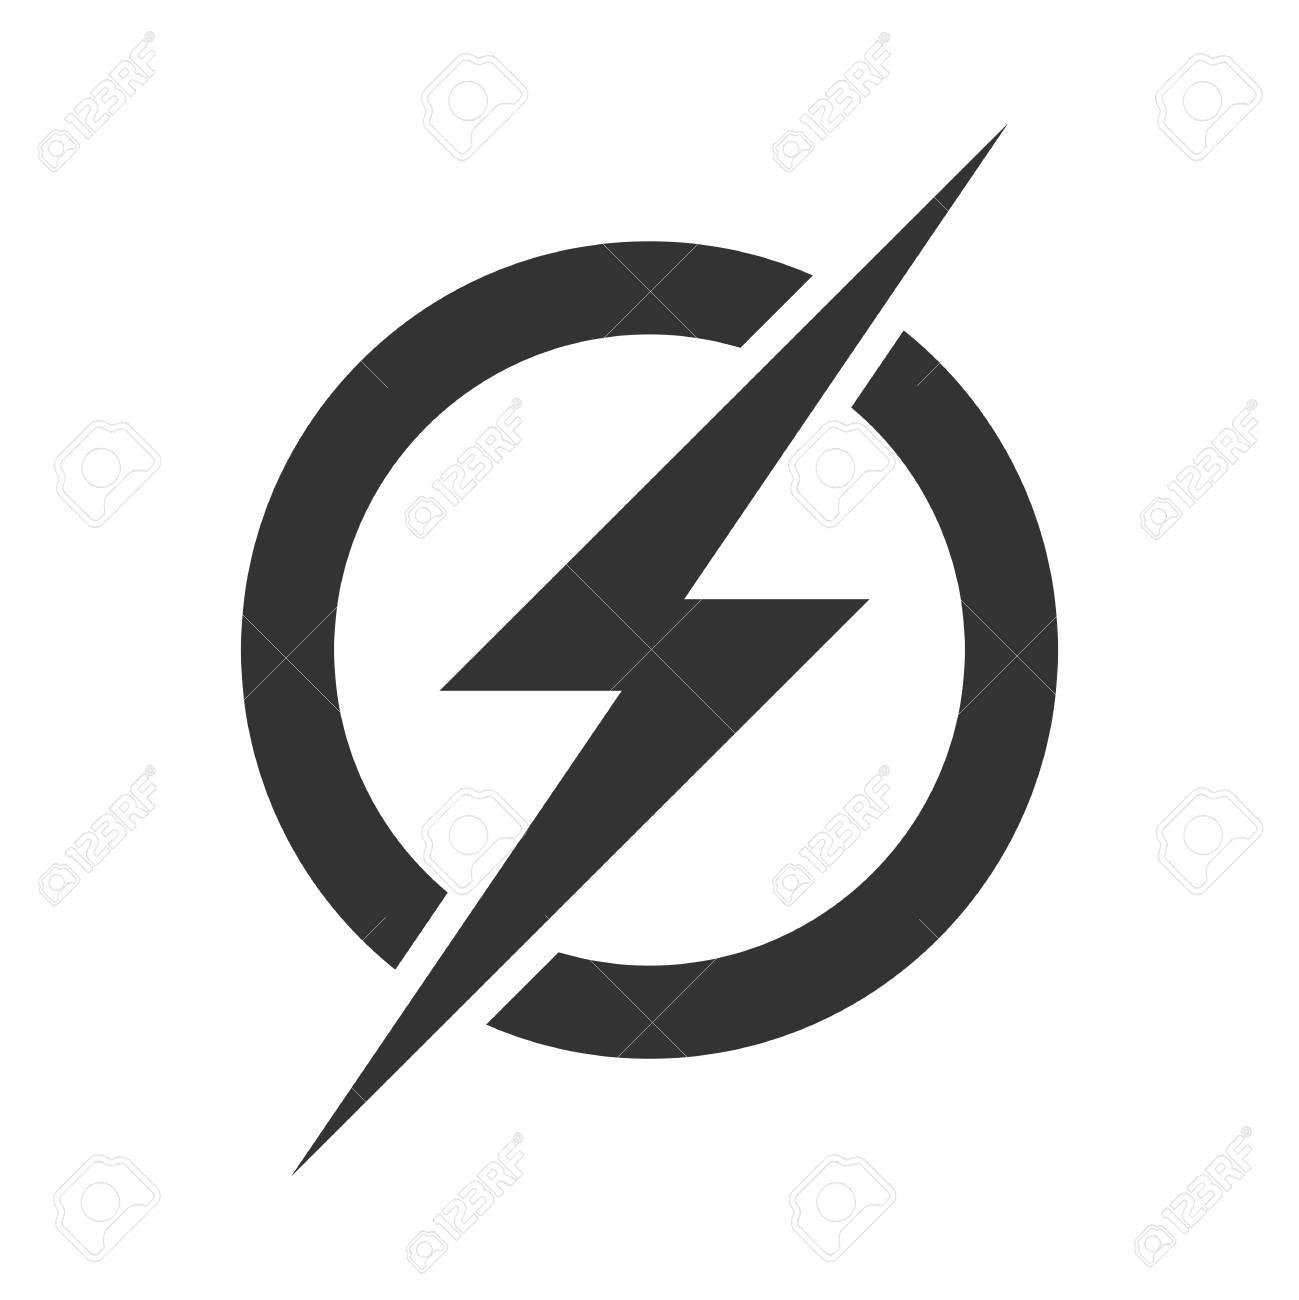 Power lightning logo icon. Vector electric fast thunder bolt symbol isolated on transparent background - 99974763